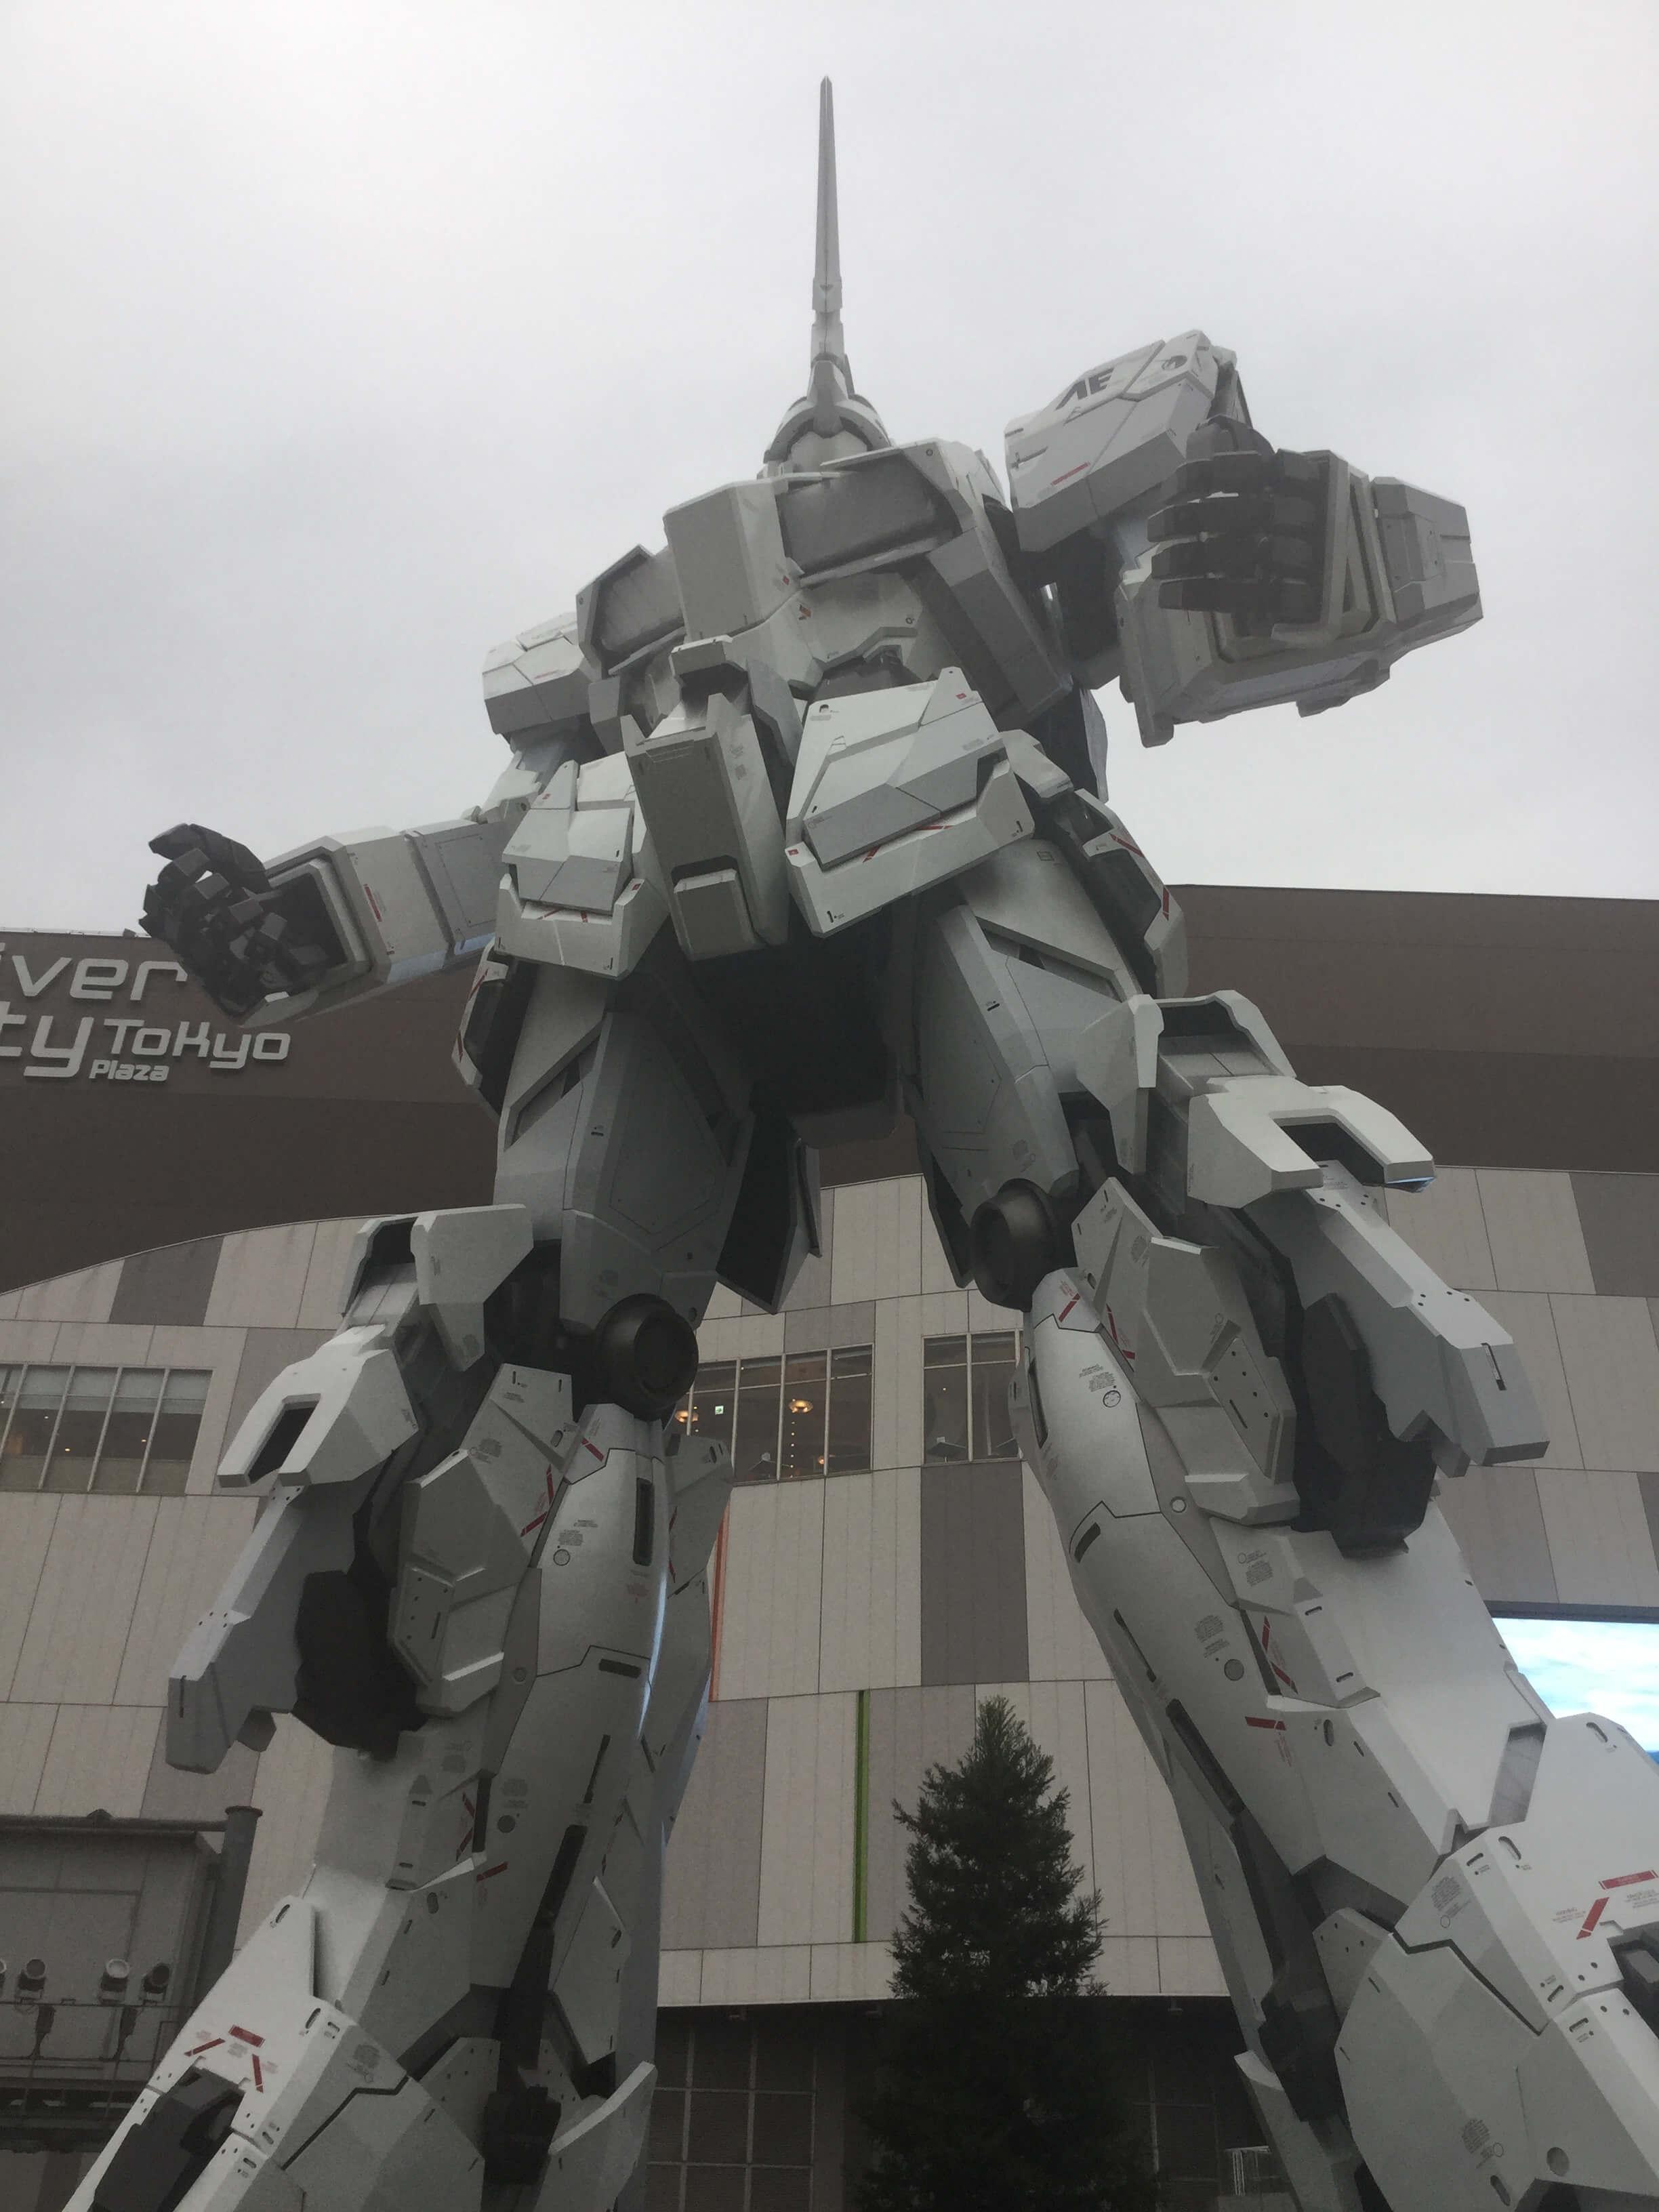 The new Gundam statue in Odaiba